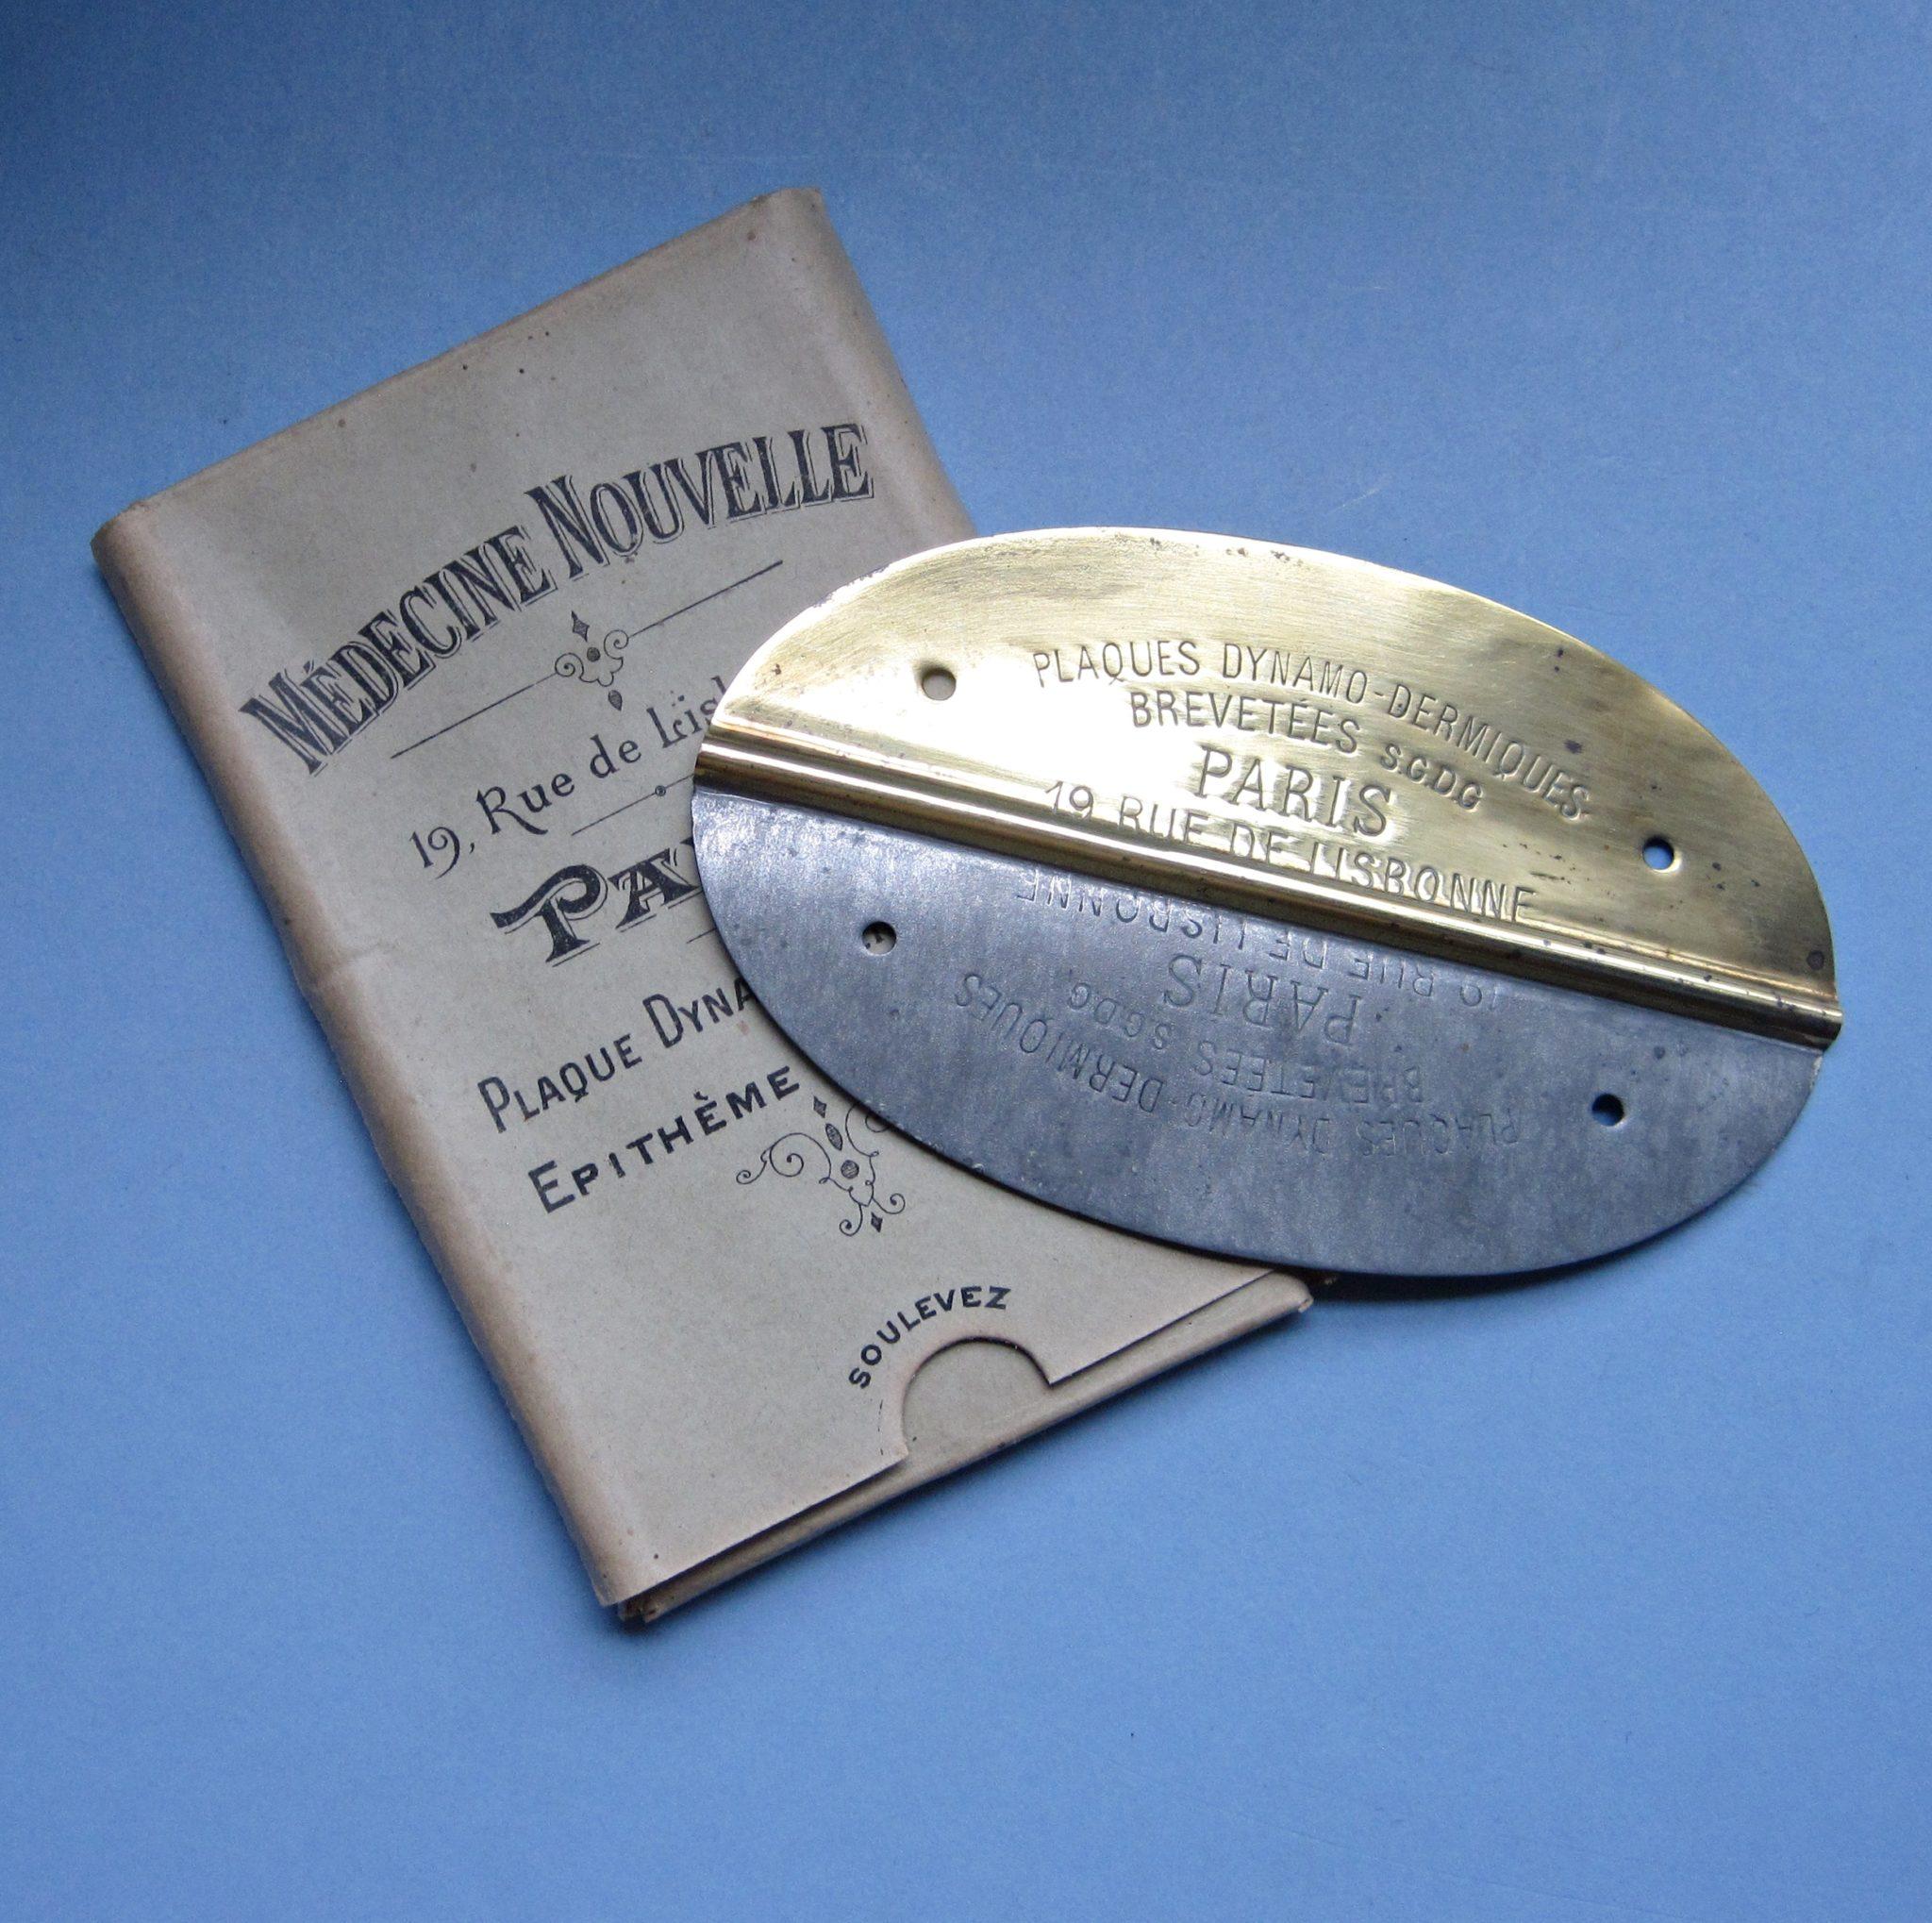 Plaque Dynamodermique: C1900 Vitalist-Mettalotherapy device